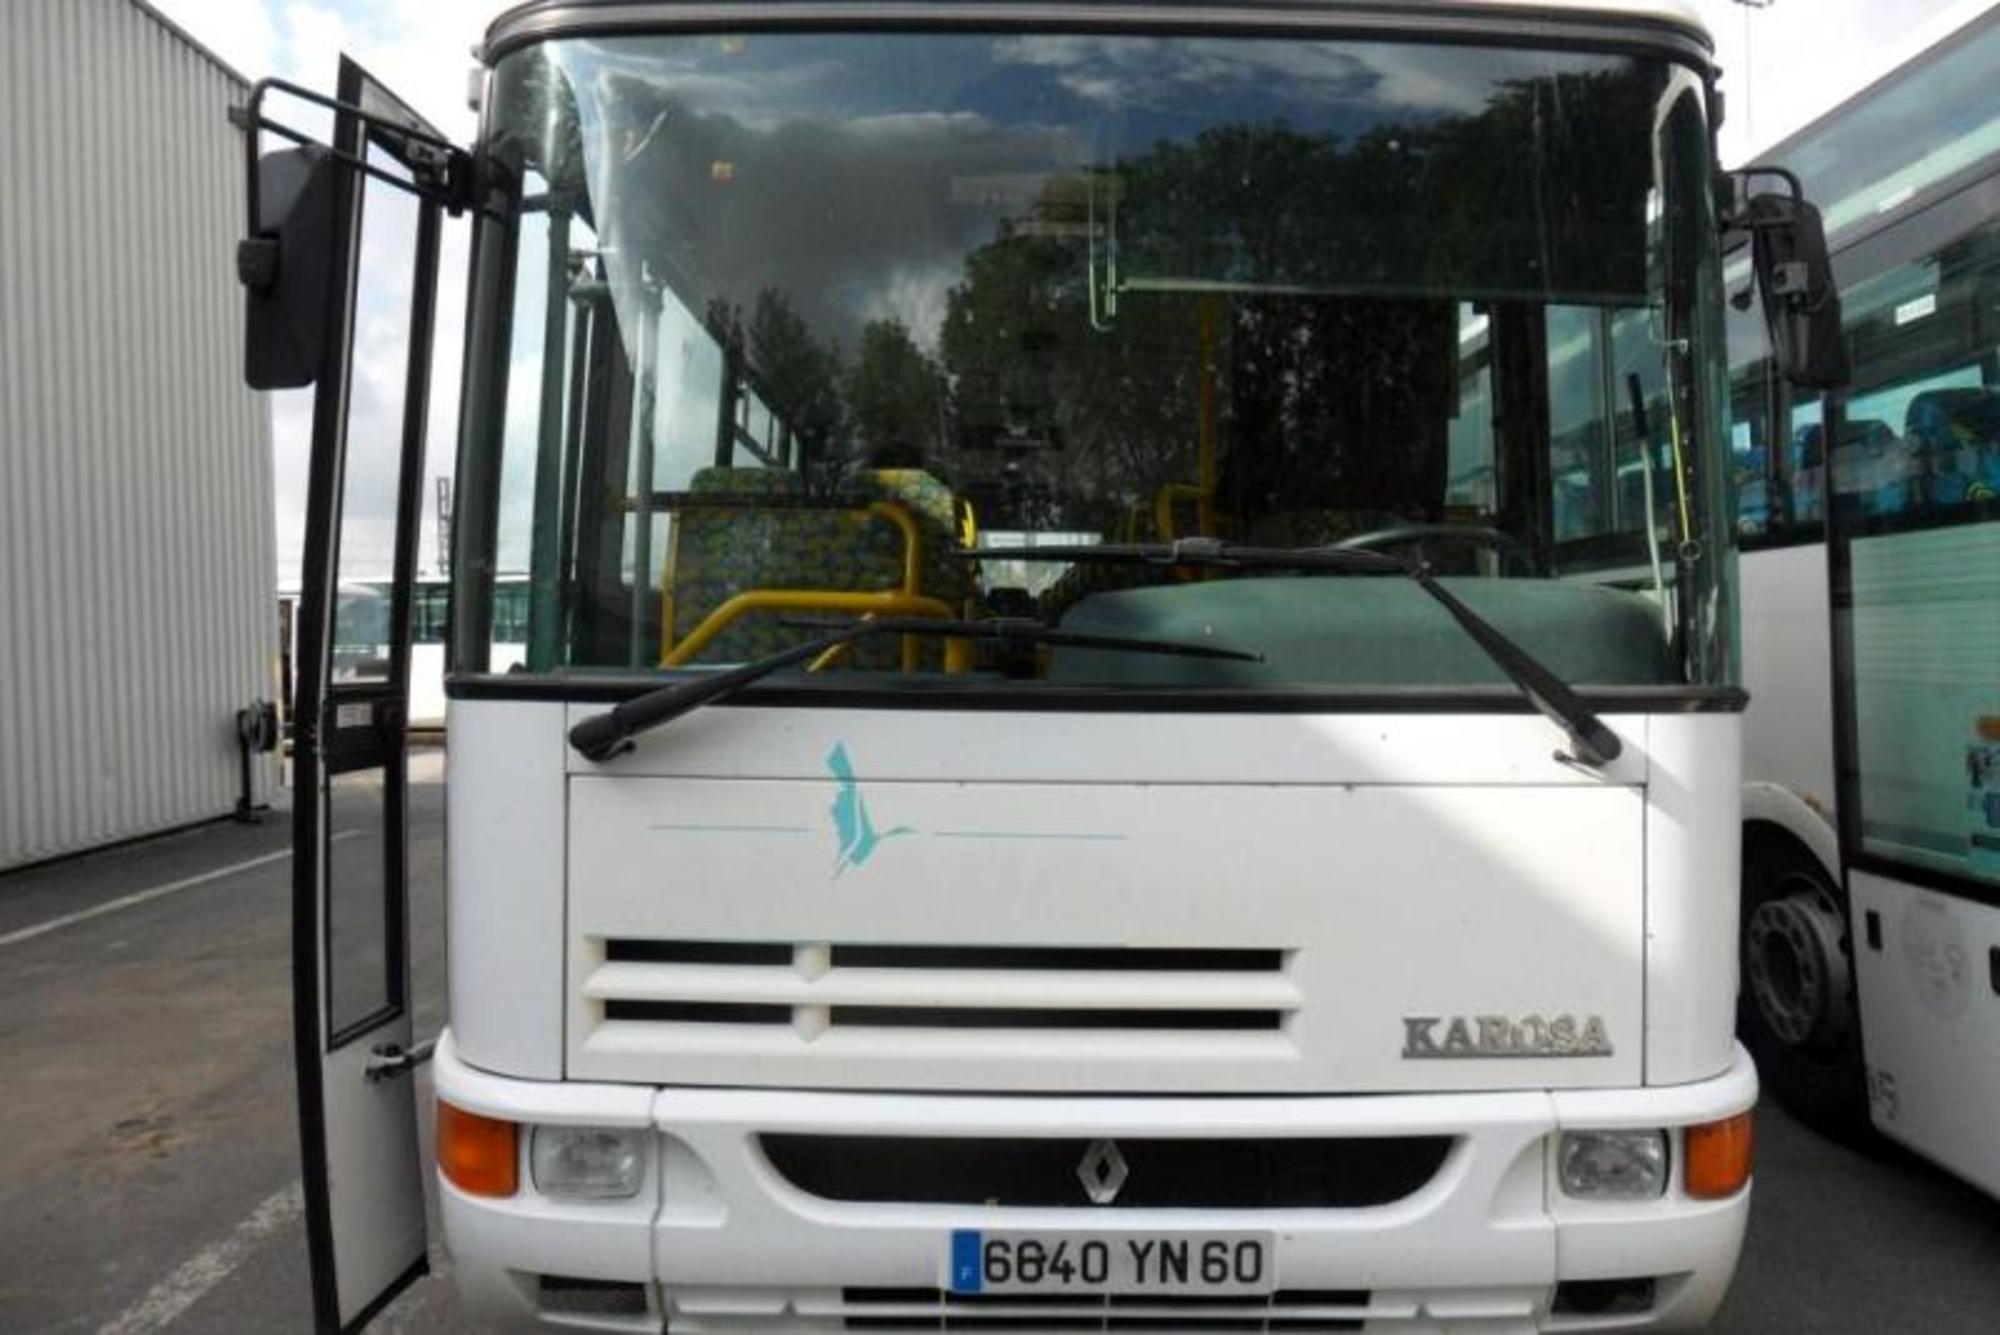 recreo karosa 1079 car bus d 39 occasion aux ench res agorastore. Black Bedroom Furniture Sets. Home Design Ideas